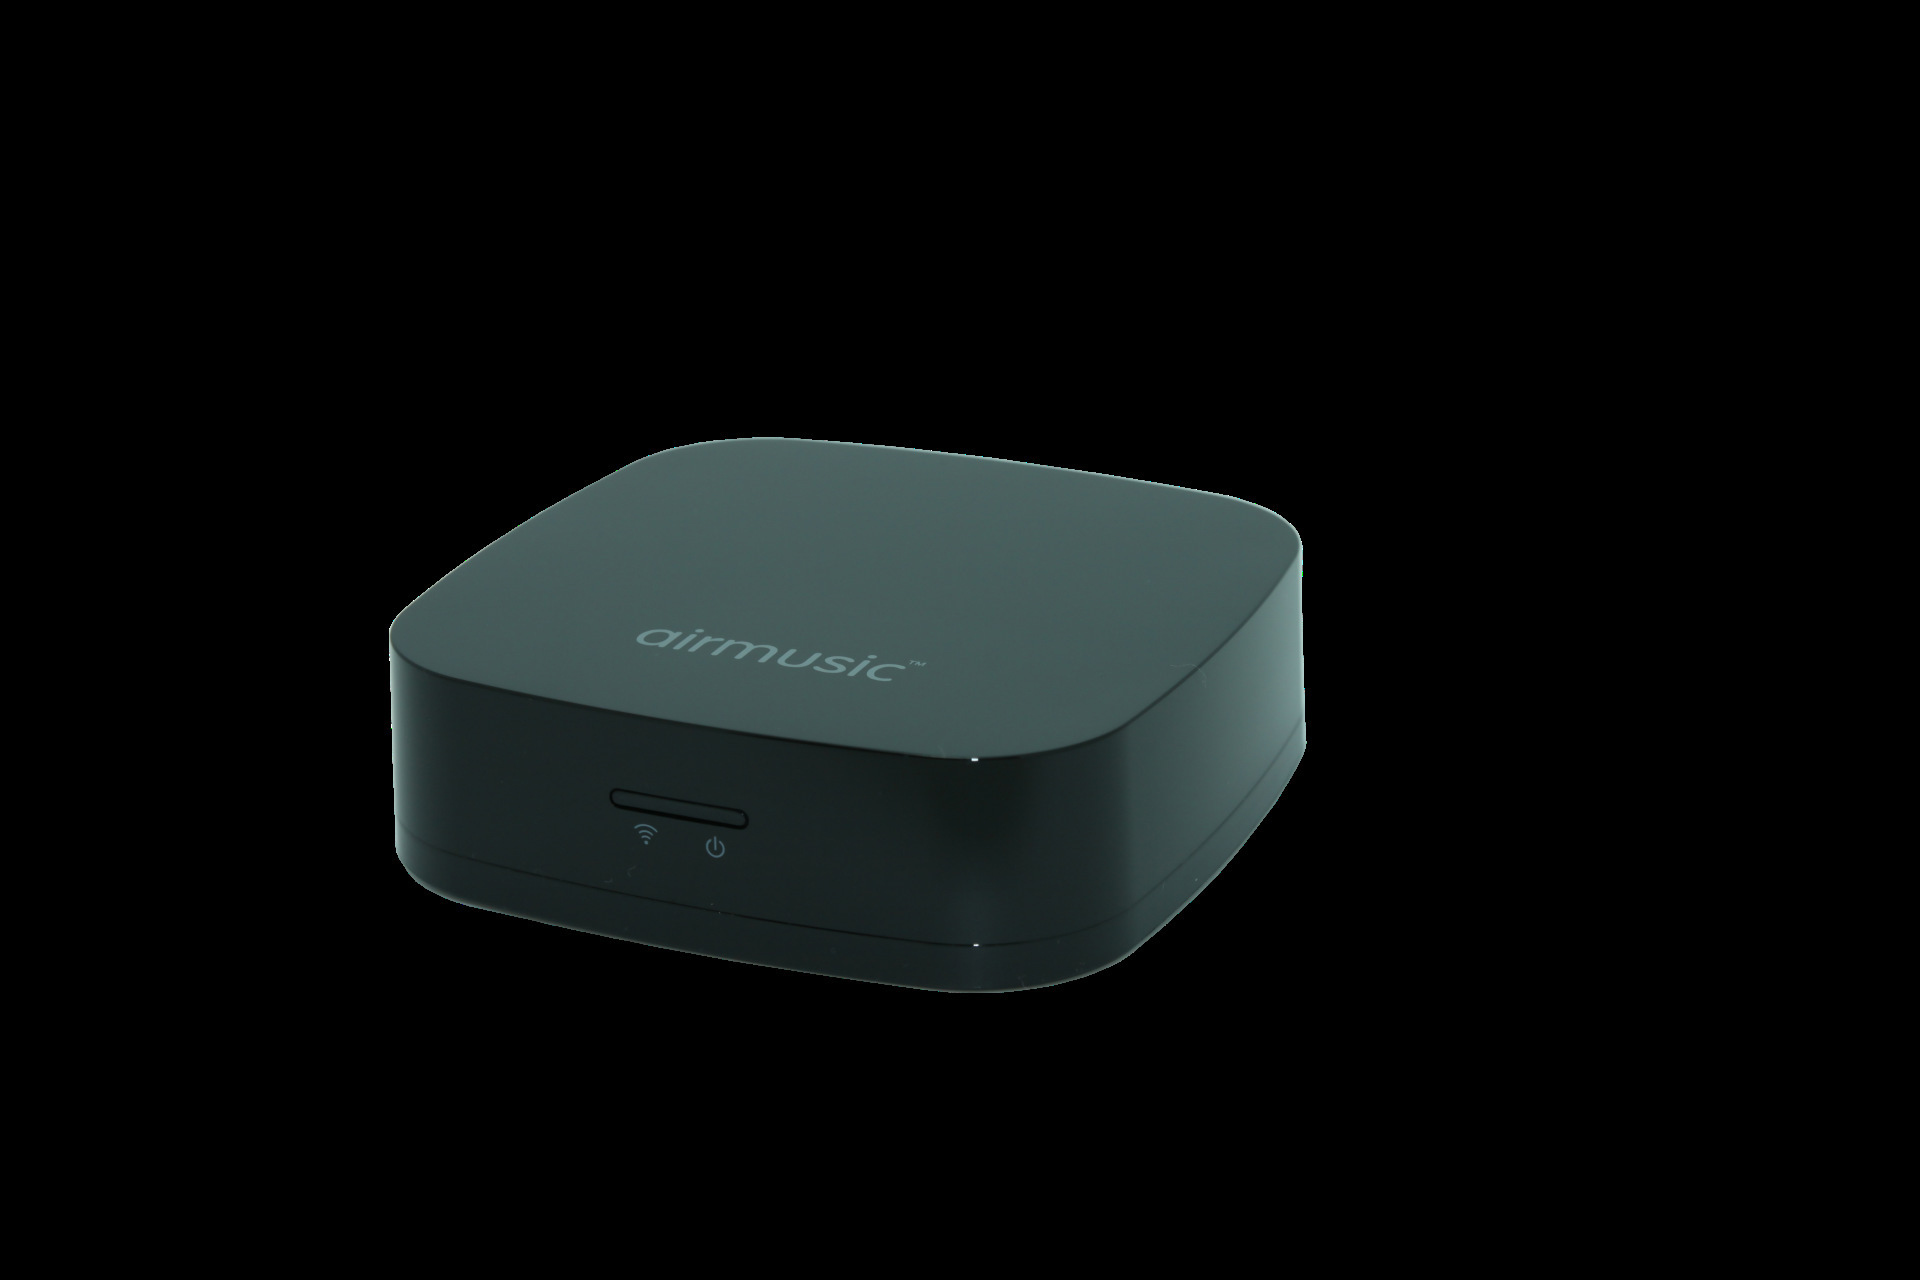 WiFi di động  Wireless audio receiver WiFi digital music box portable WiFi